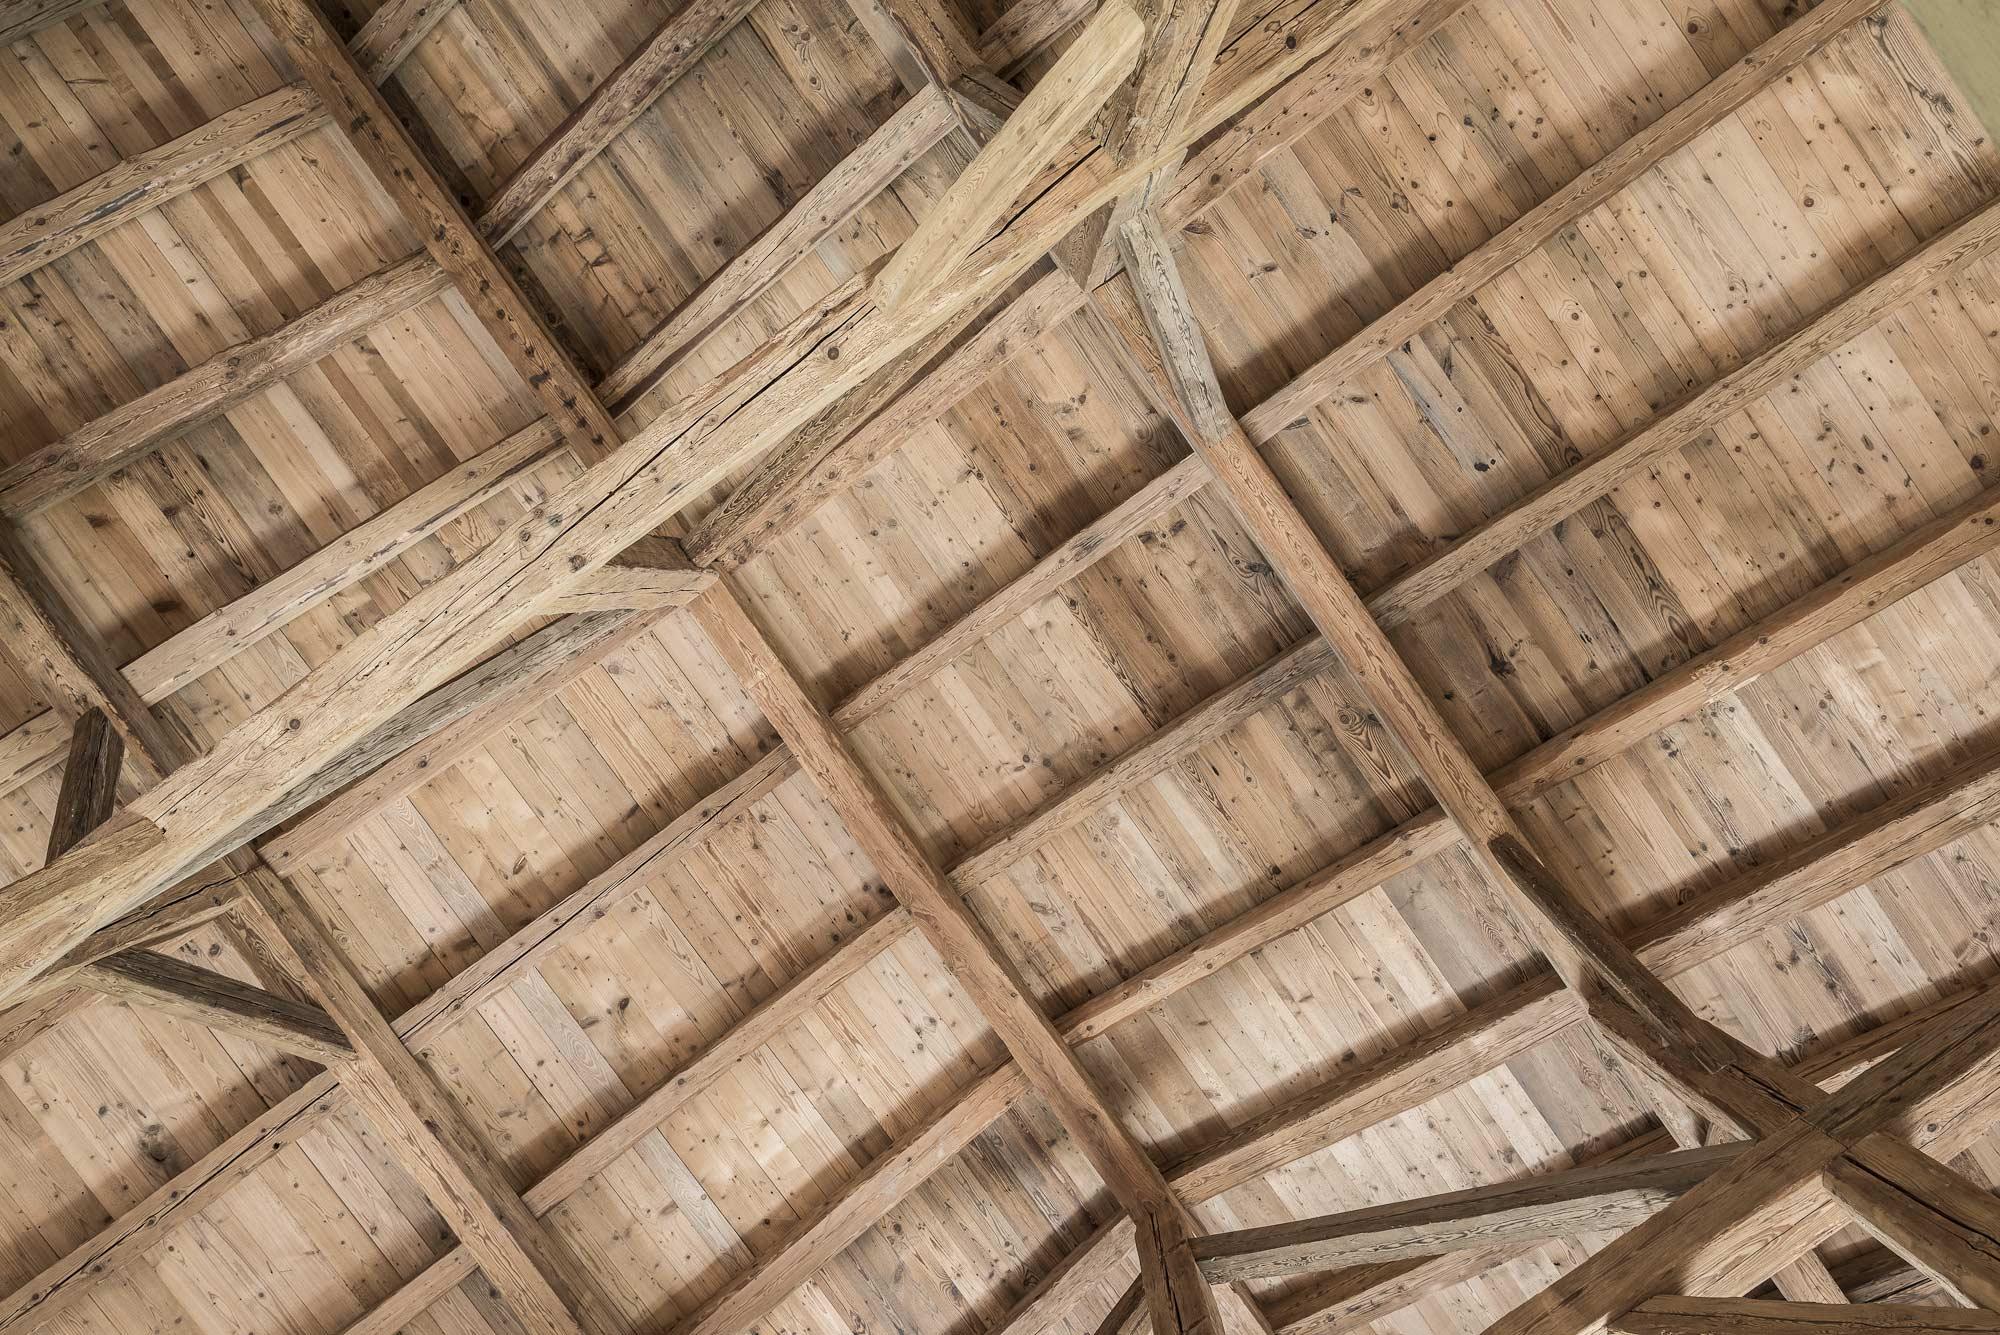 zimmerei-stoib-holzbau-sanierung-hof-umbau-altholz-innenausbau-festsaal-15.jpg